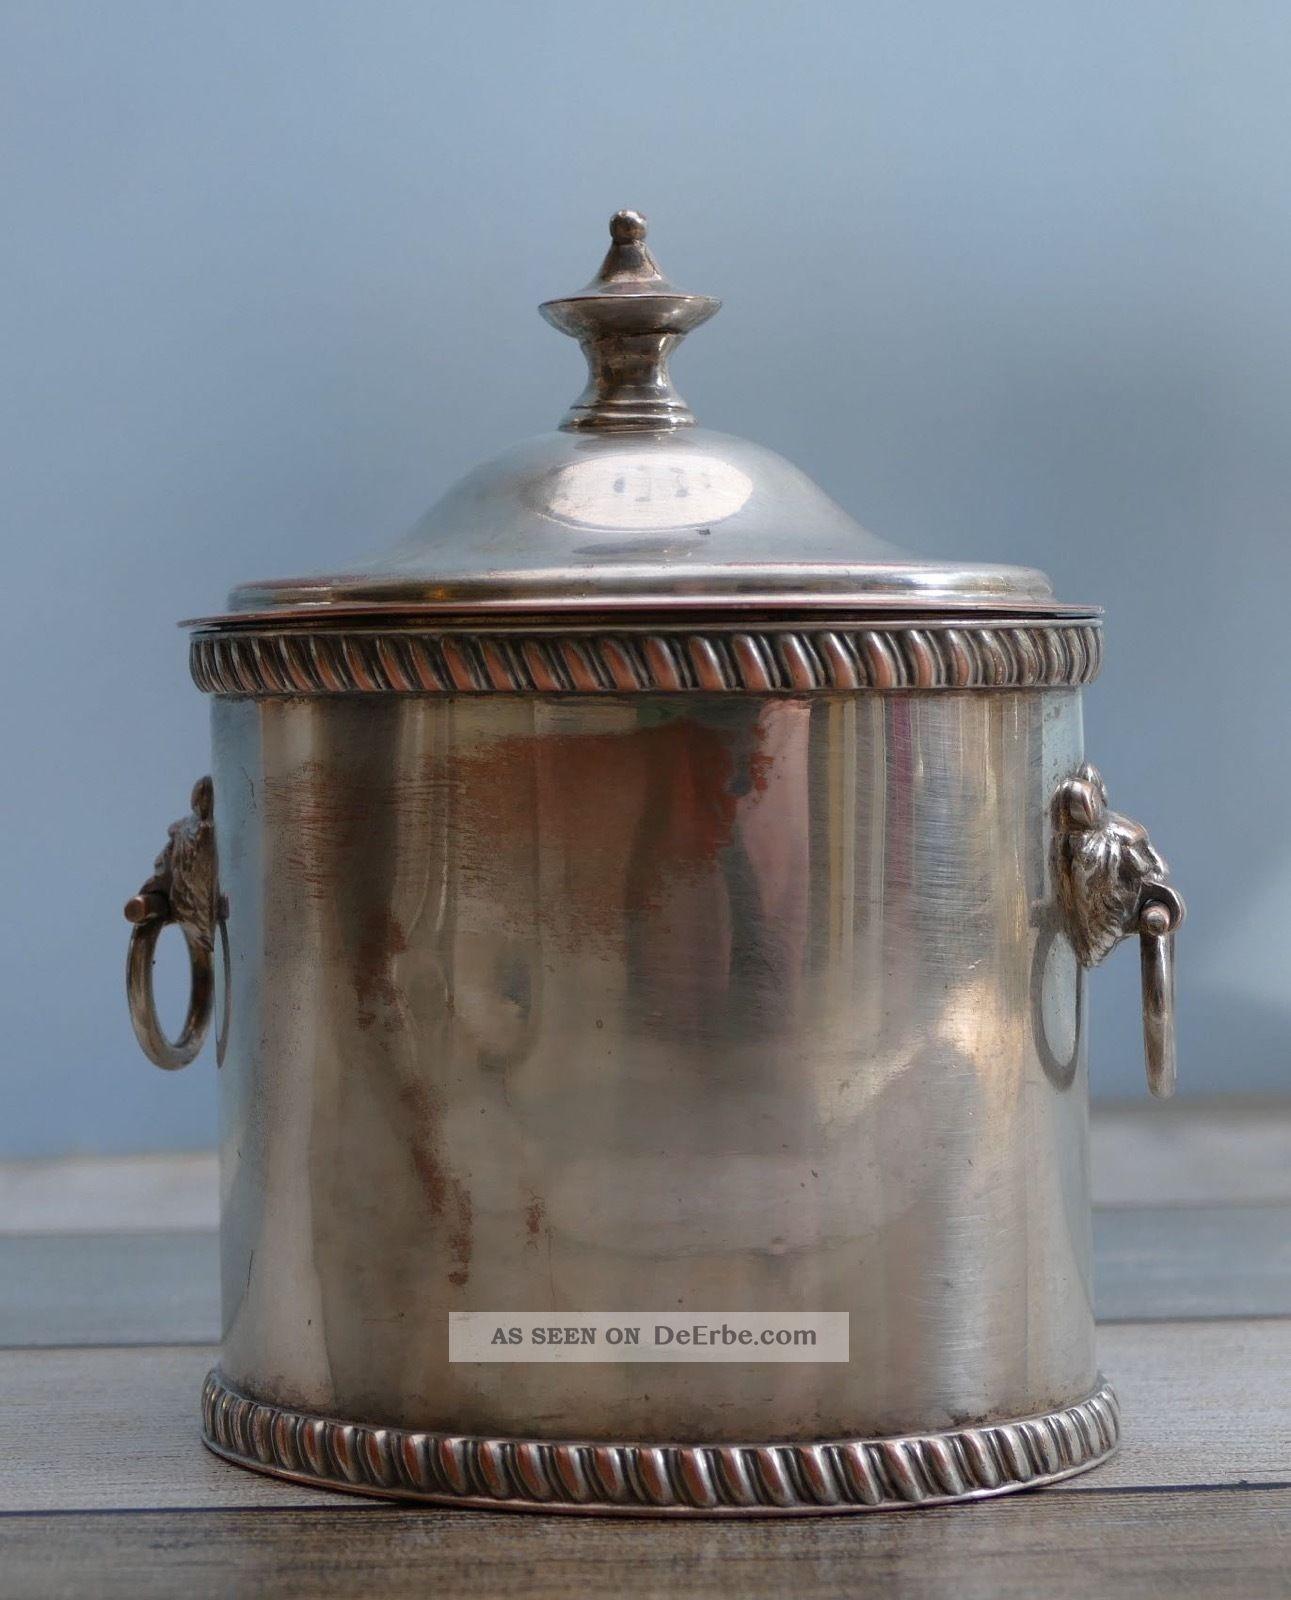 Kleine Engelse Ovale Silver Plated Suikerdoos 1880 Objekte vor 1945 Bild